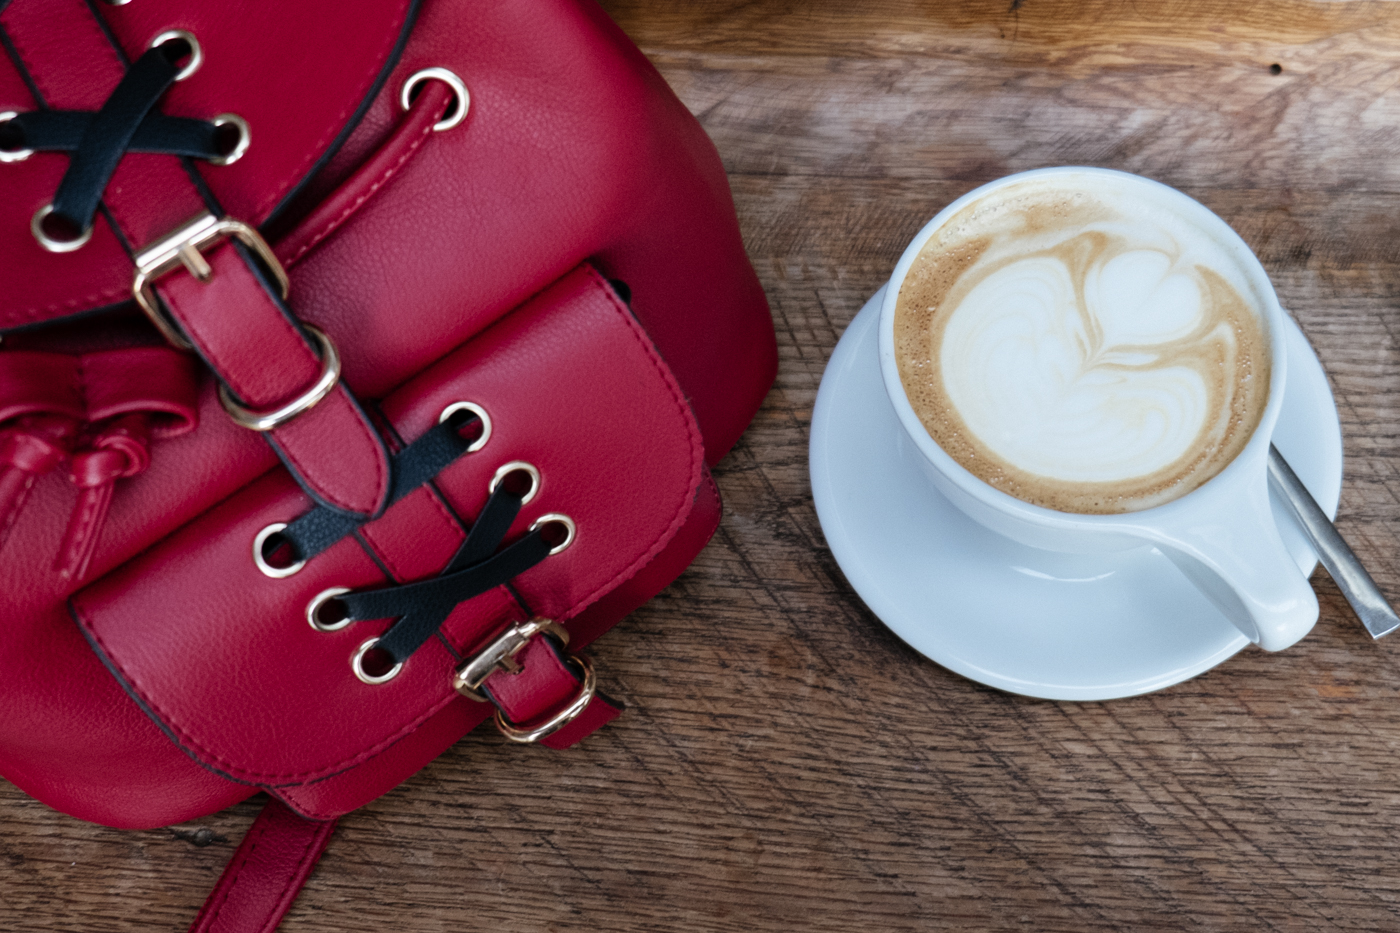 Coffee art and red backback from Debora Dahl